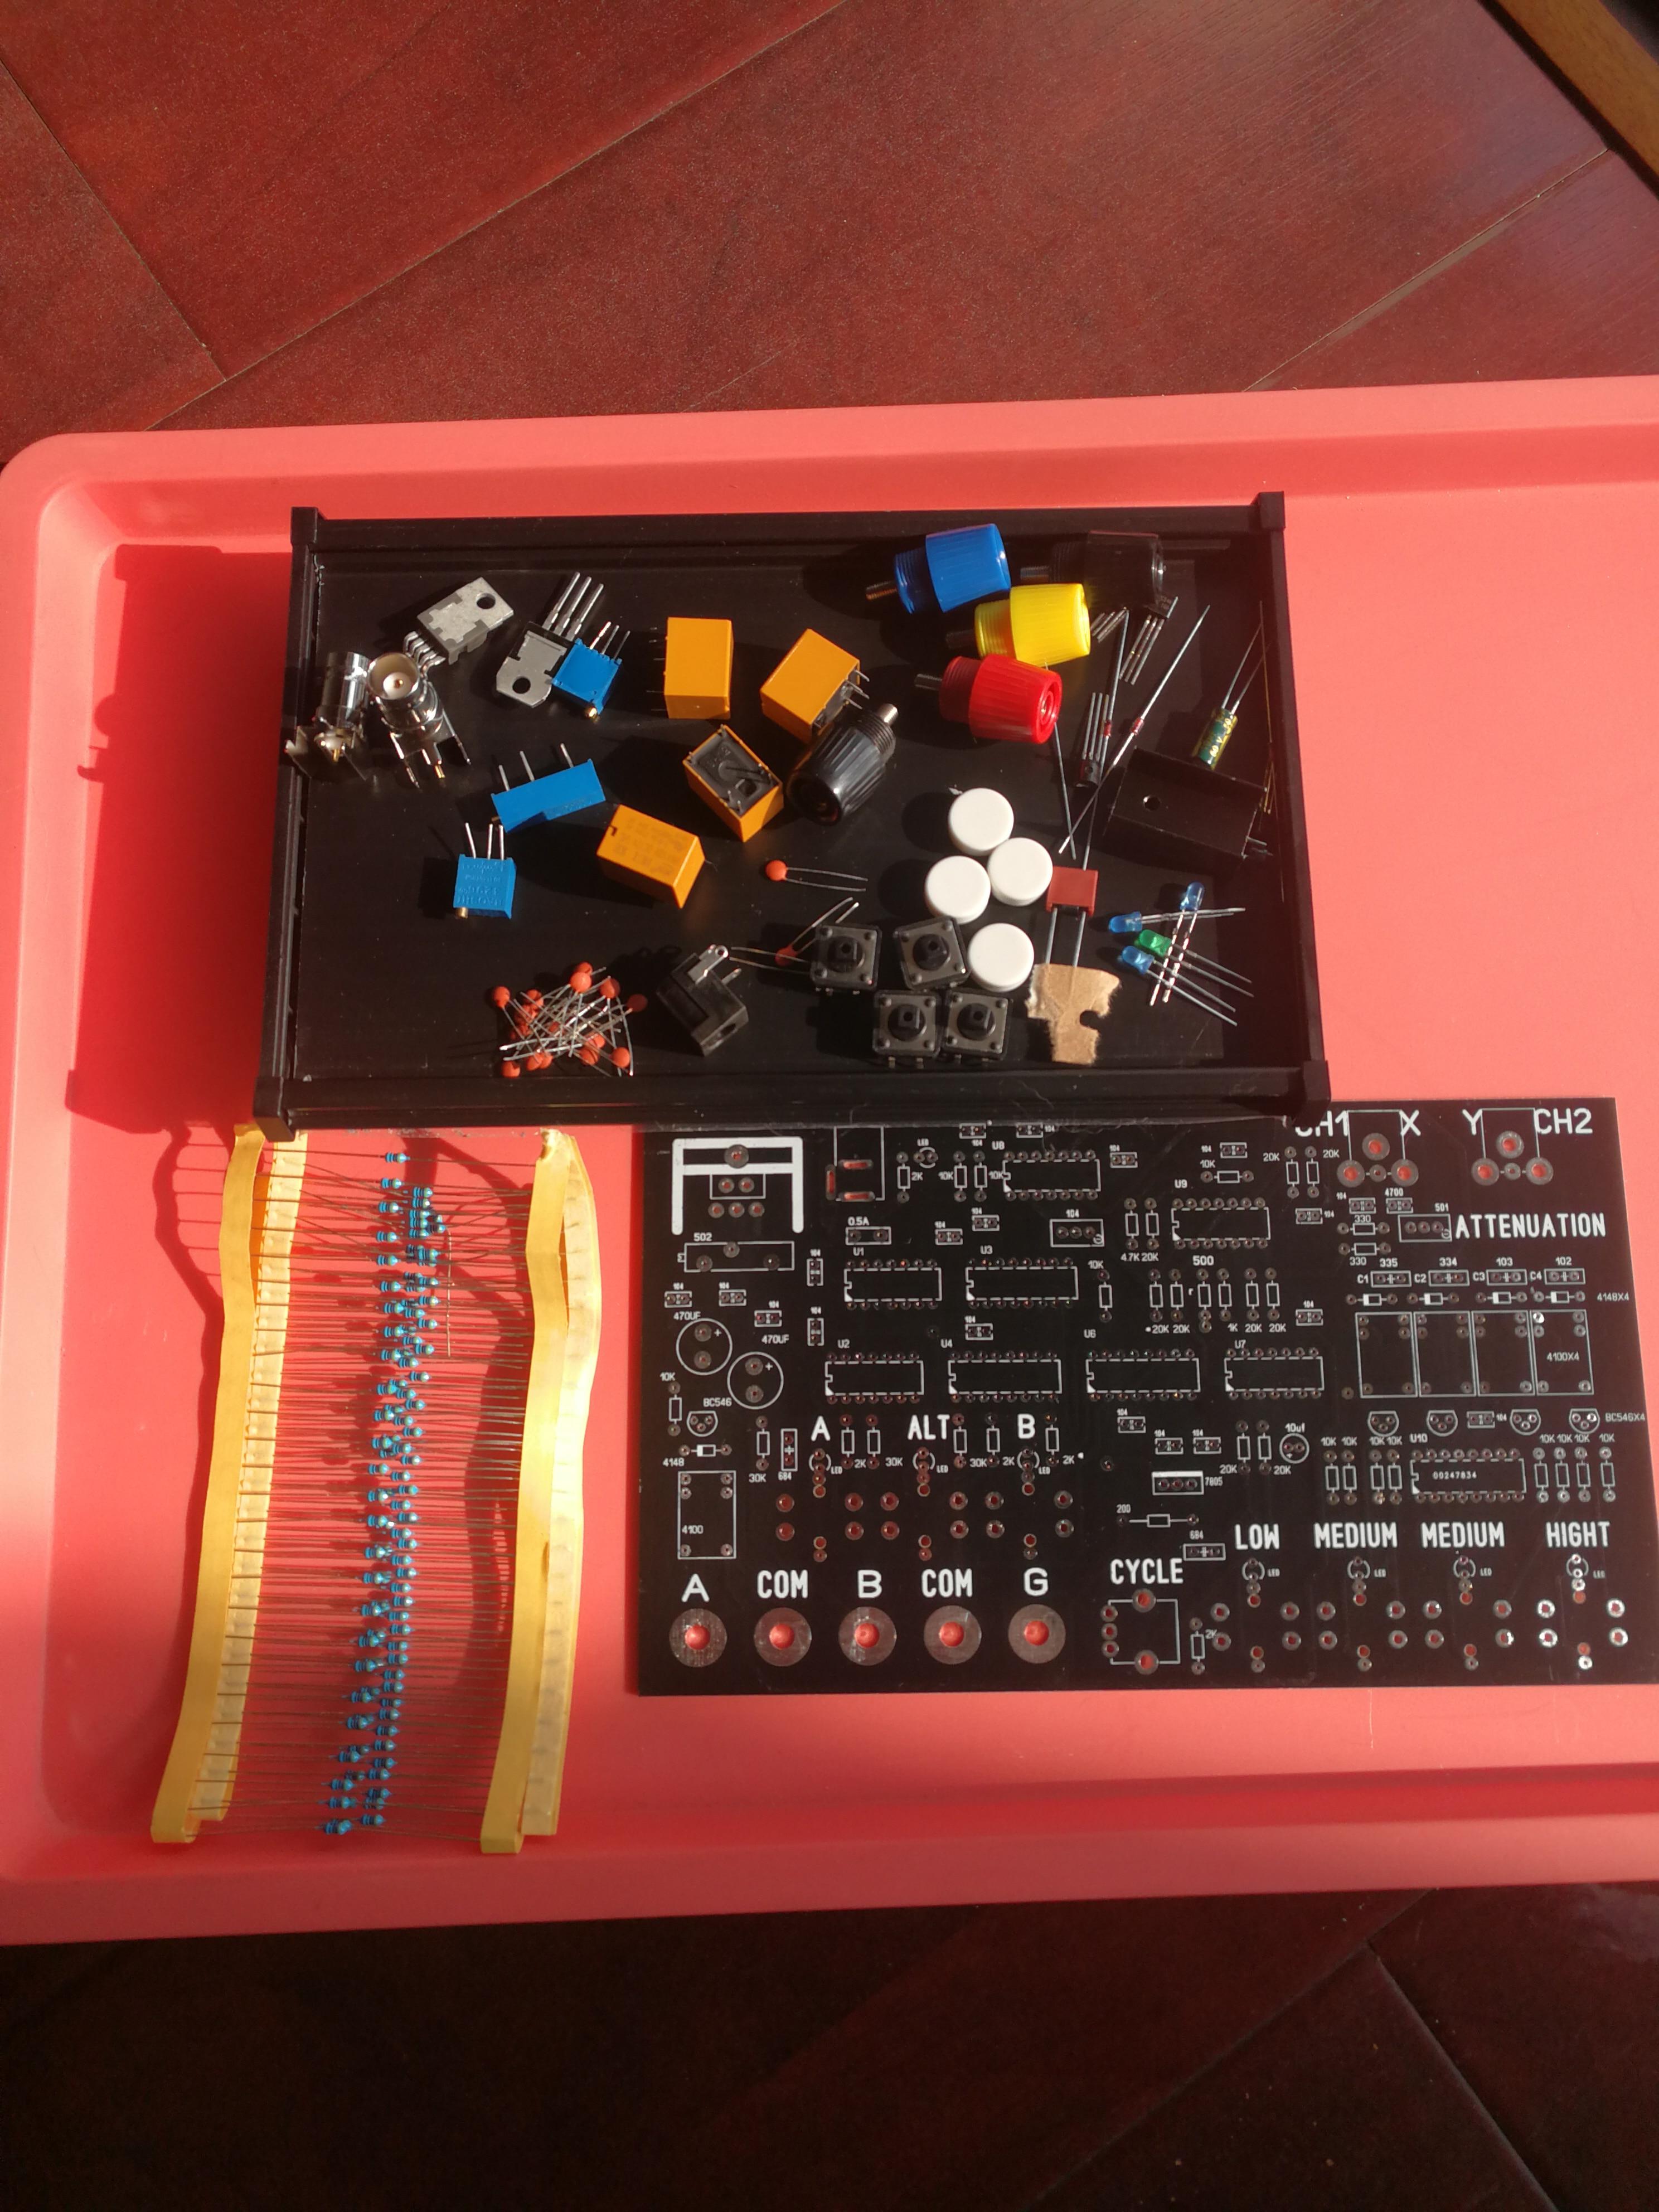 Dual-channel Circuit Board Repair Online Tester Kit, VI Curve Tester